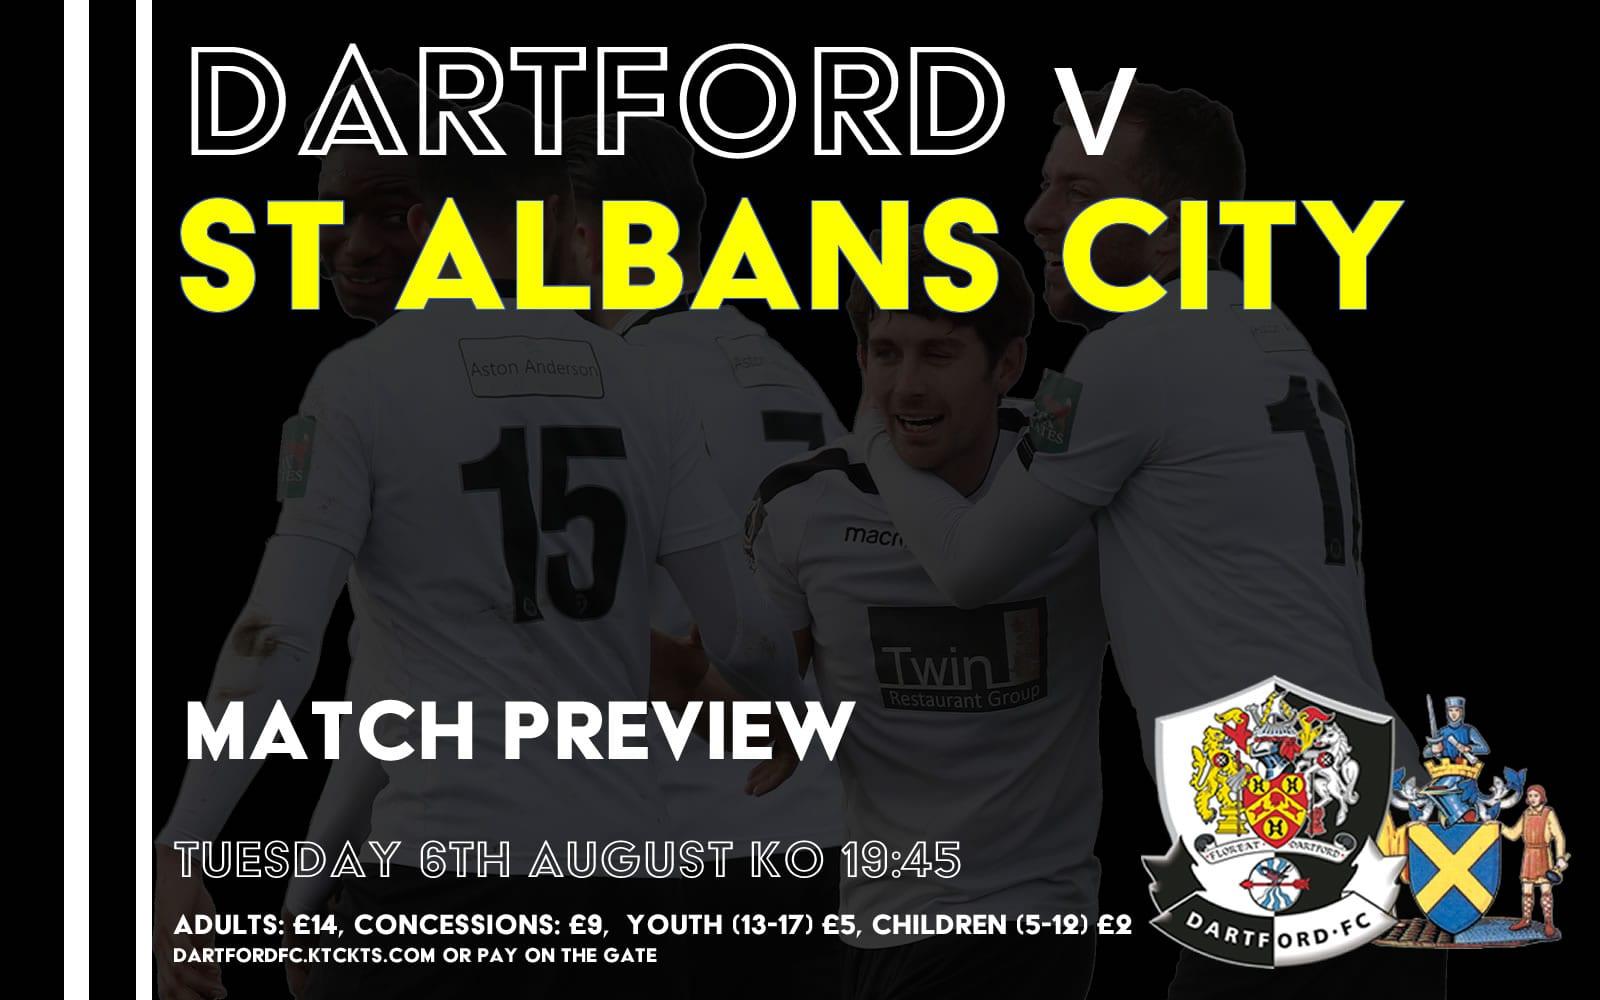 Dartford v St Albans City